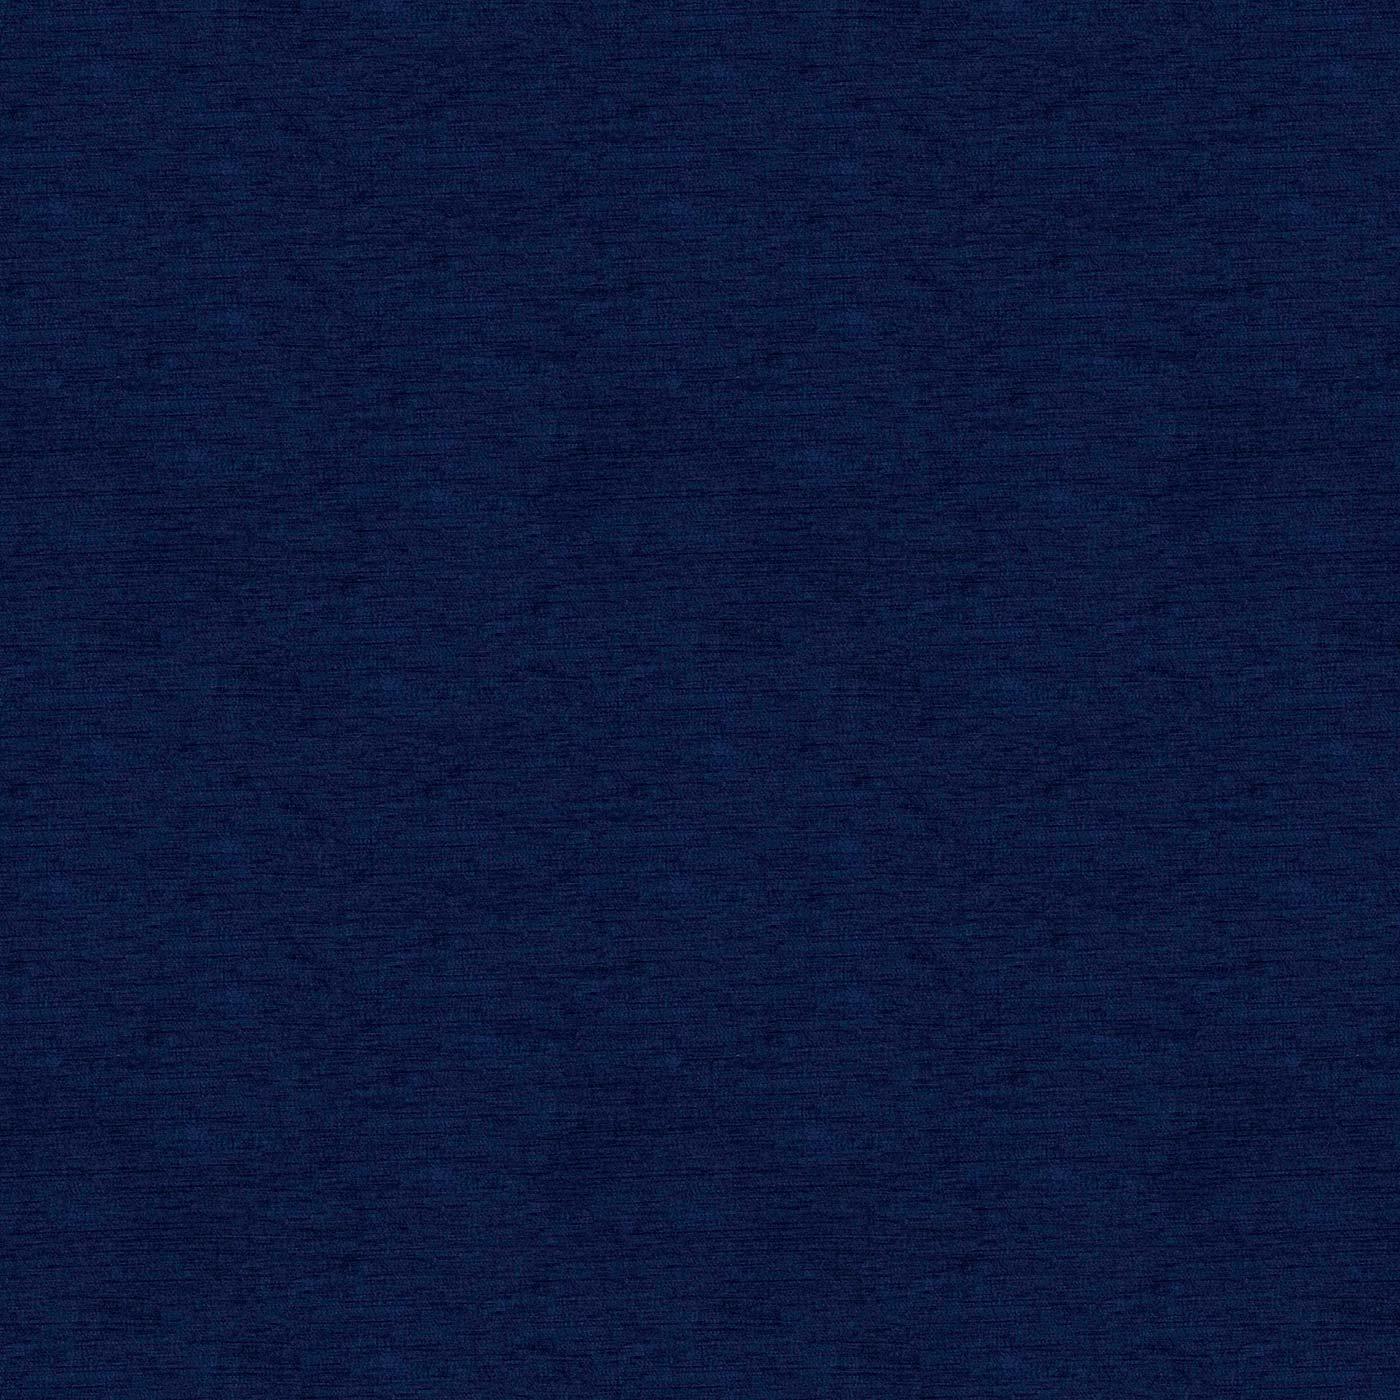 York Navy